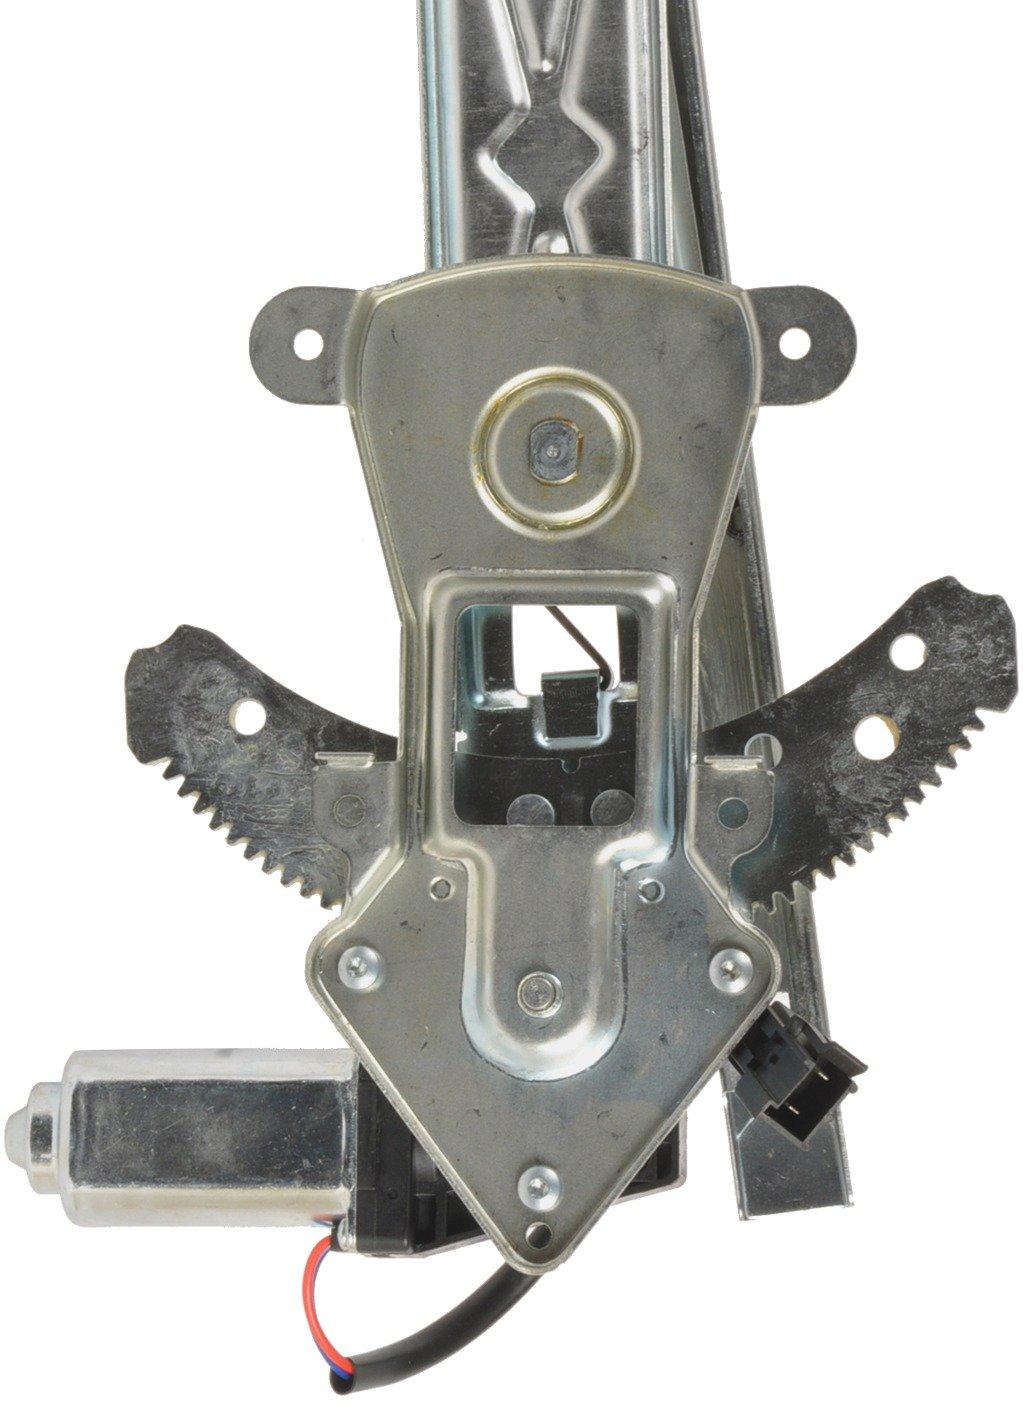 Cardone Select 82-3031AR New Window Lift Motor with Regulator,1 Pack